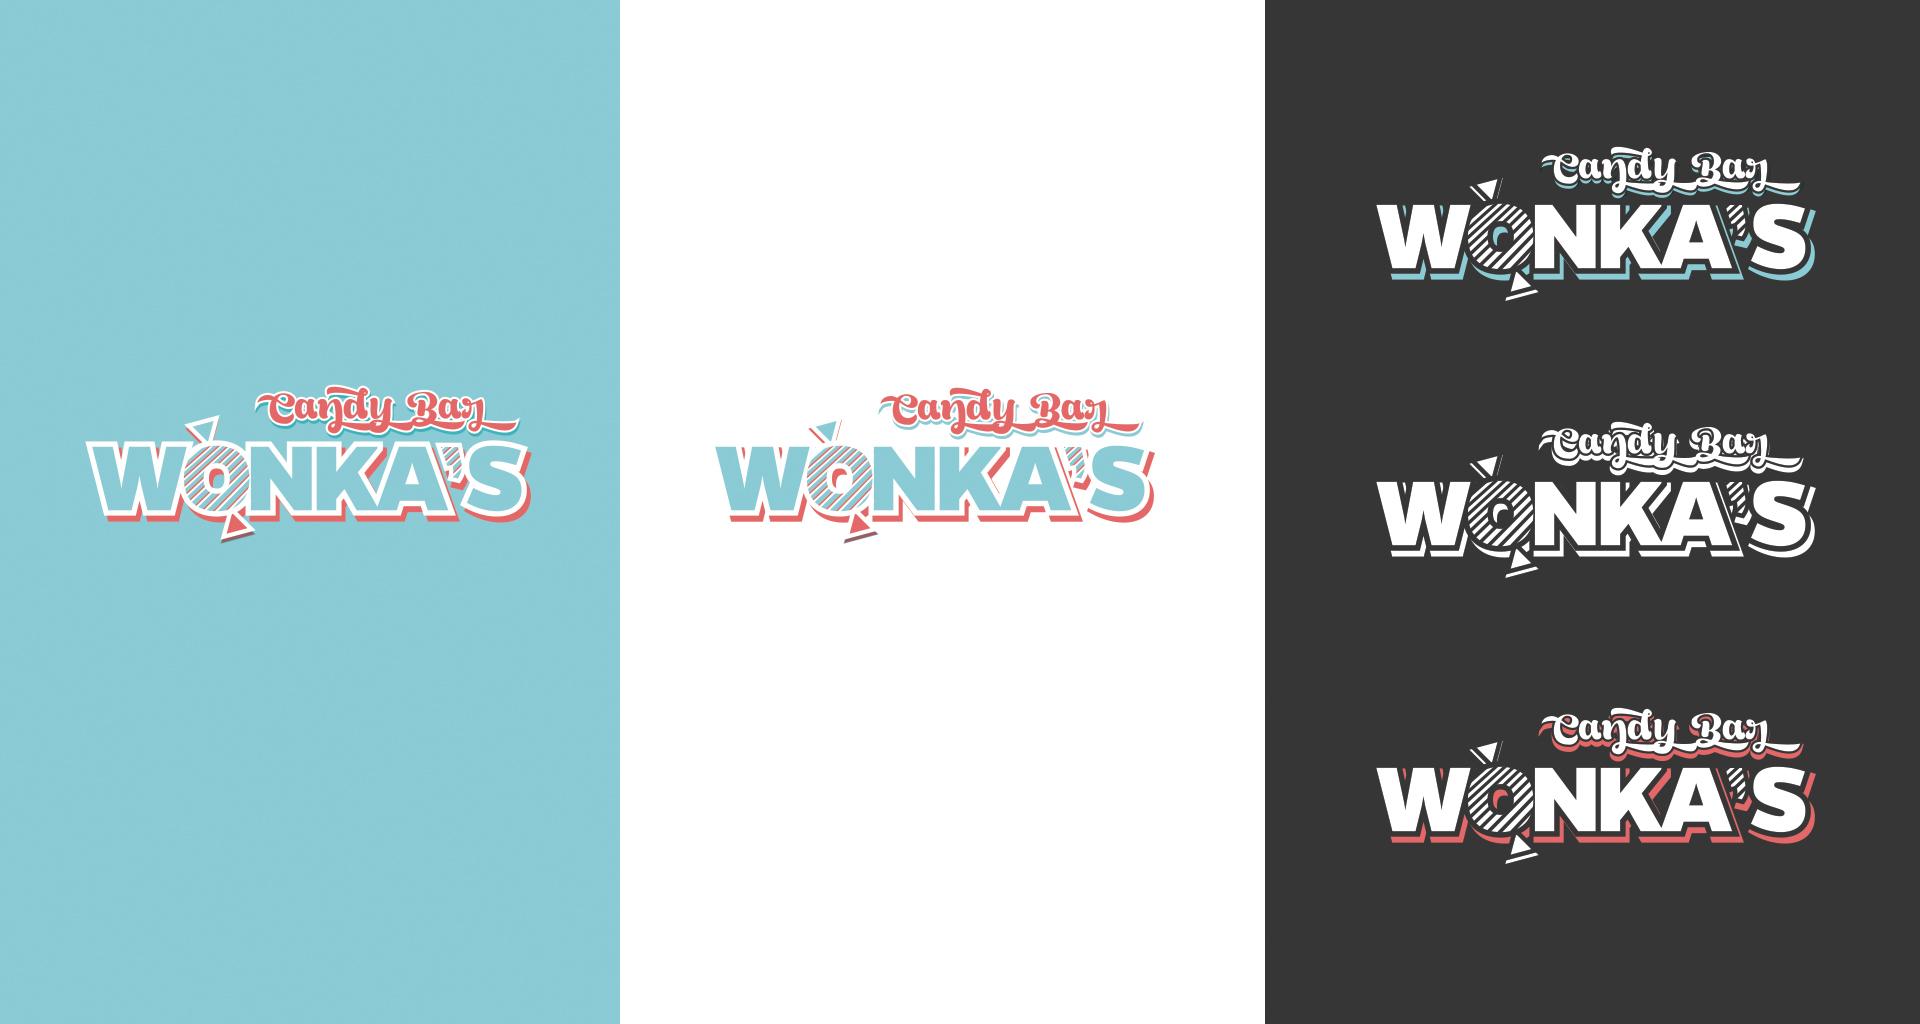 Разработка логотипа магазина сладостей со всего мира. фото f_3655a271a5c342b8.jpg